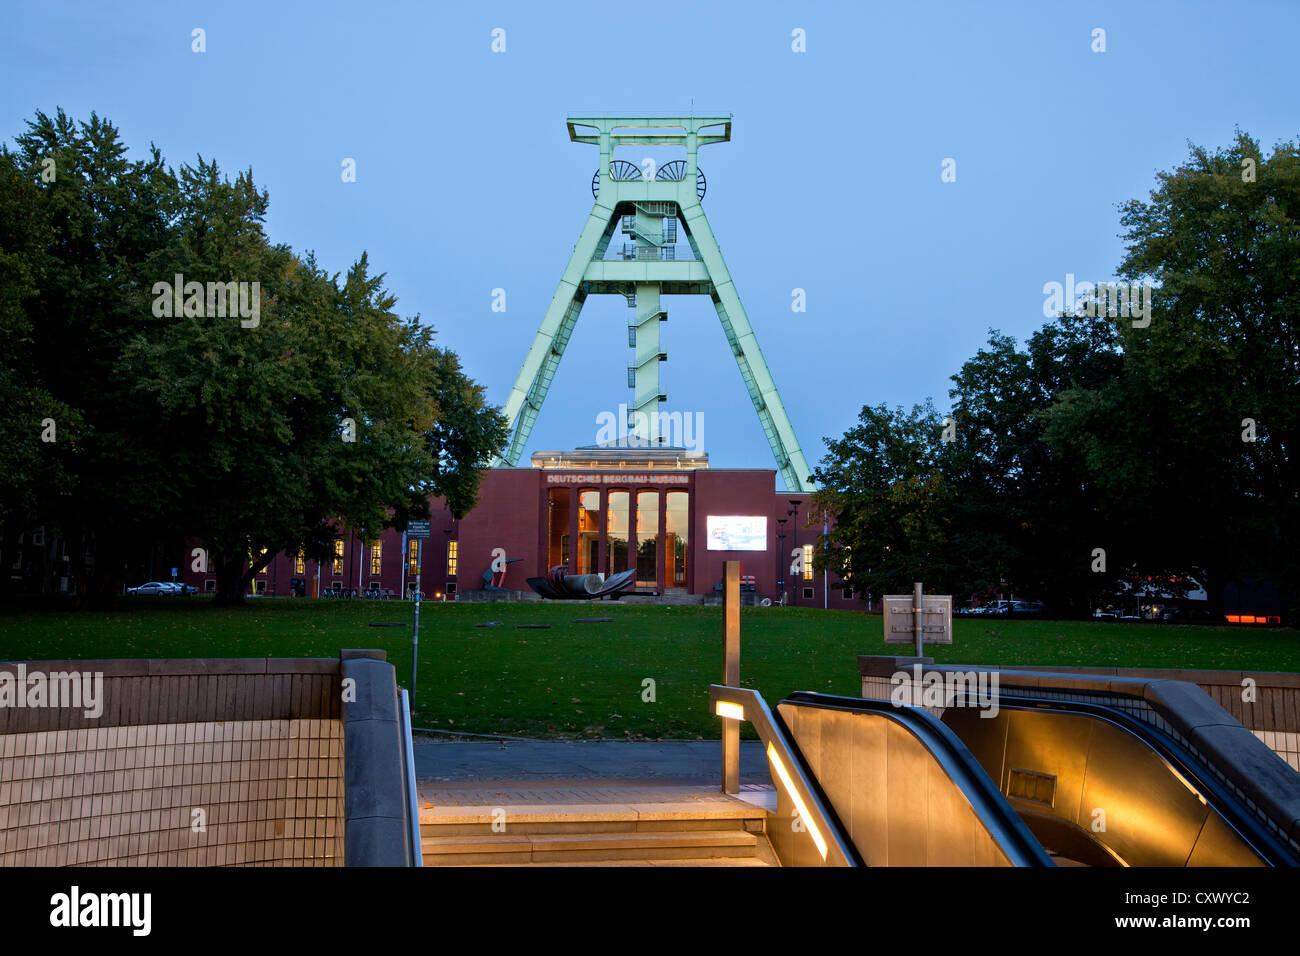 The German Mining Museum 'Deutsche Bergbau-Museum' with winding tower in Bochum, North Rhine-Westphalia, - Stock Image